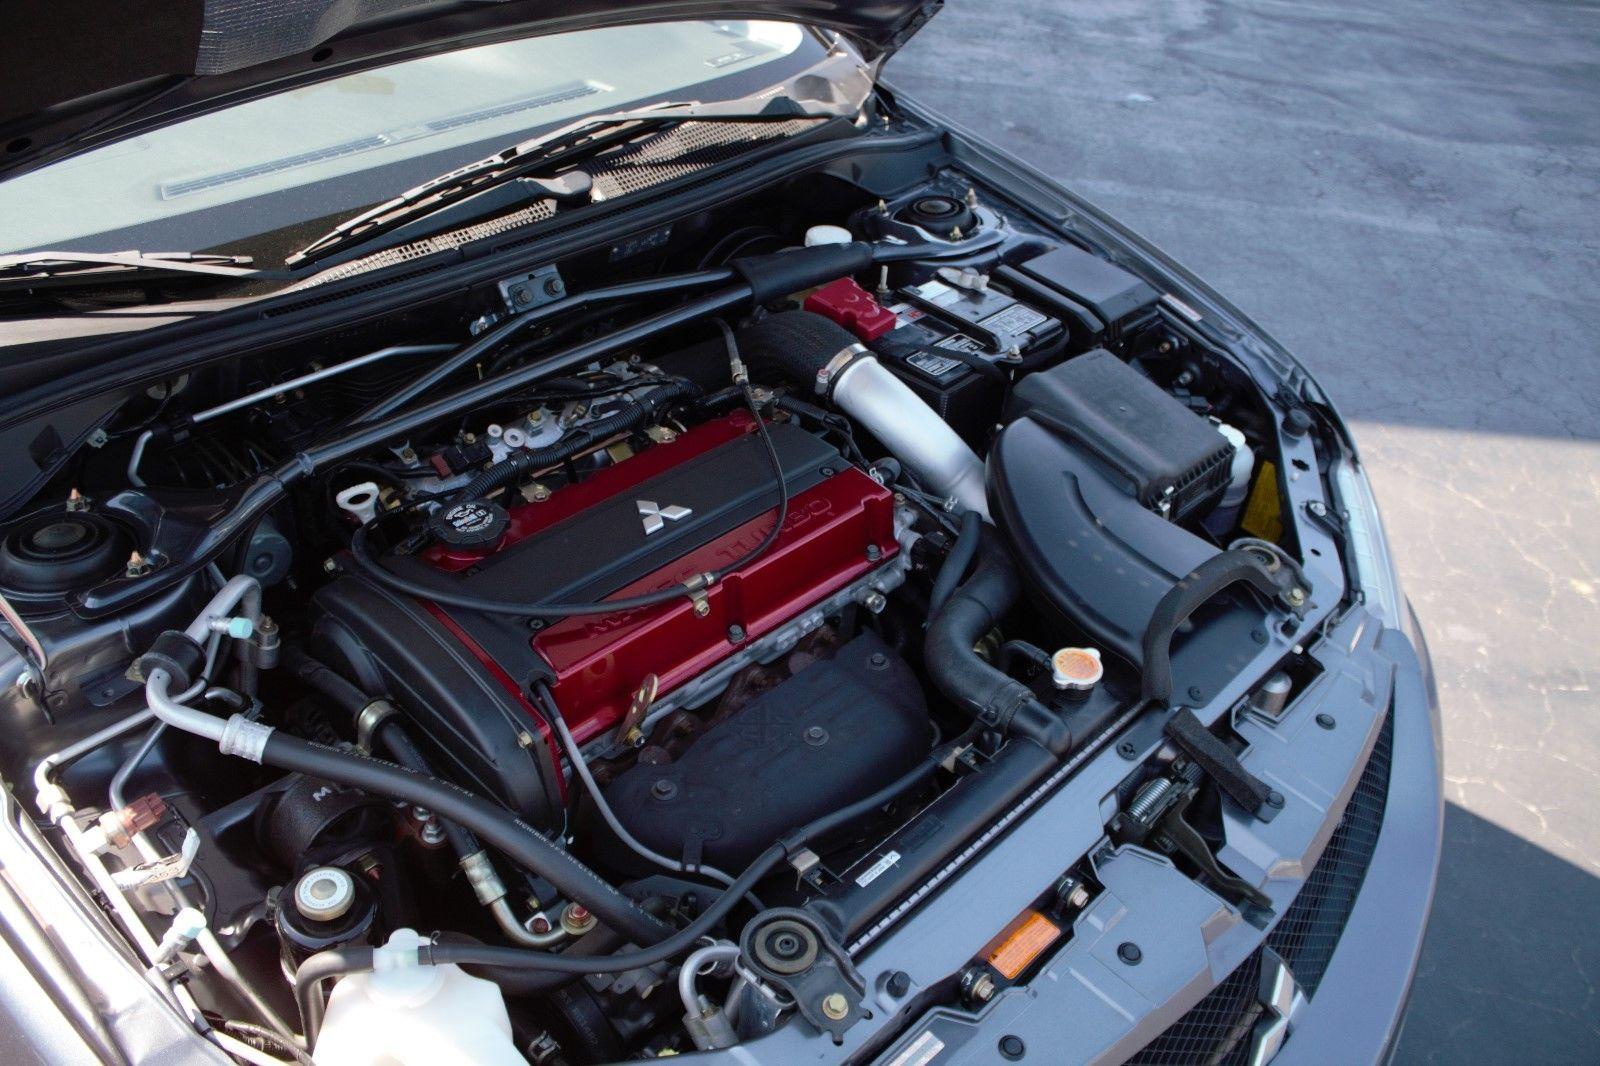 9-Mile Mitsubishi Evo IX MR Selling For $100k On eBay - car news